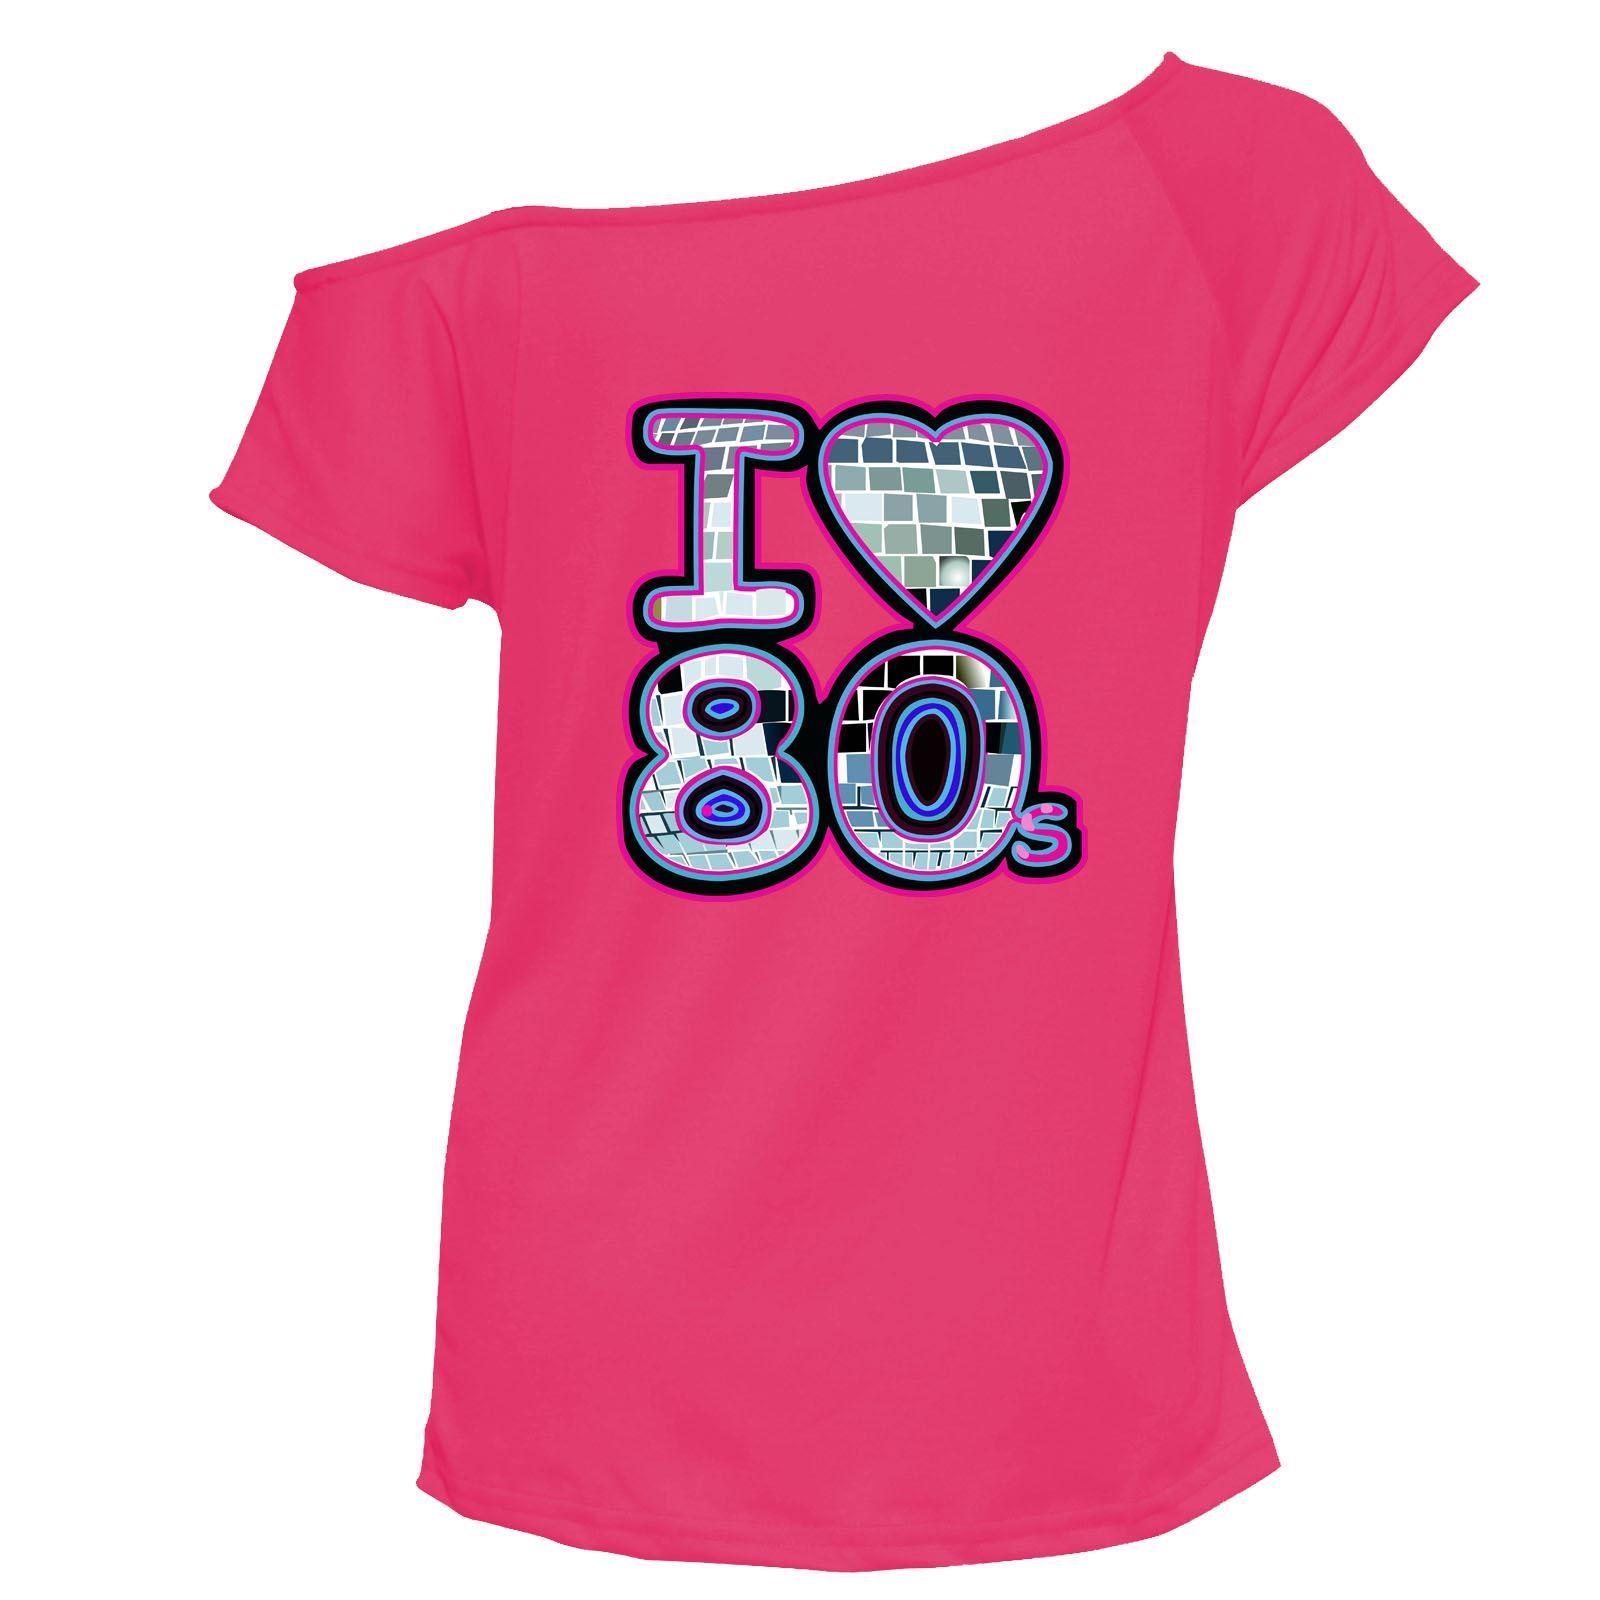 Senoras-vestido-elegante-I-Love-80s-Festival-decada-de-1980-Musica-Pop-Fiesta-Top-Camiseta